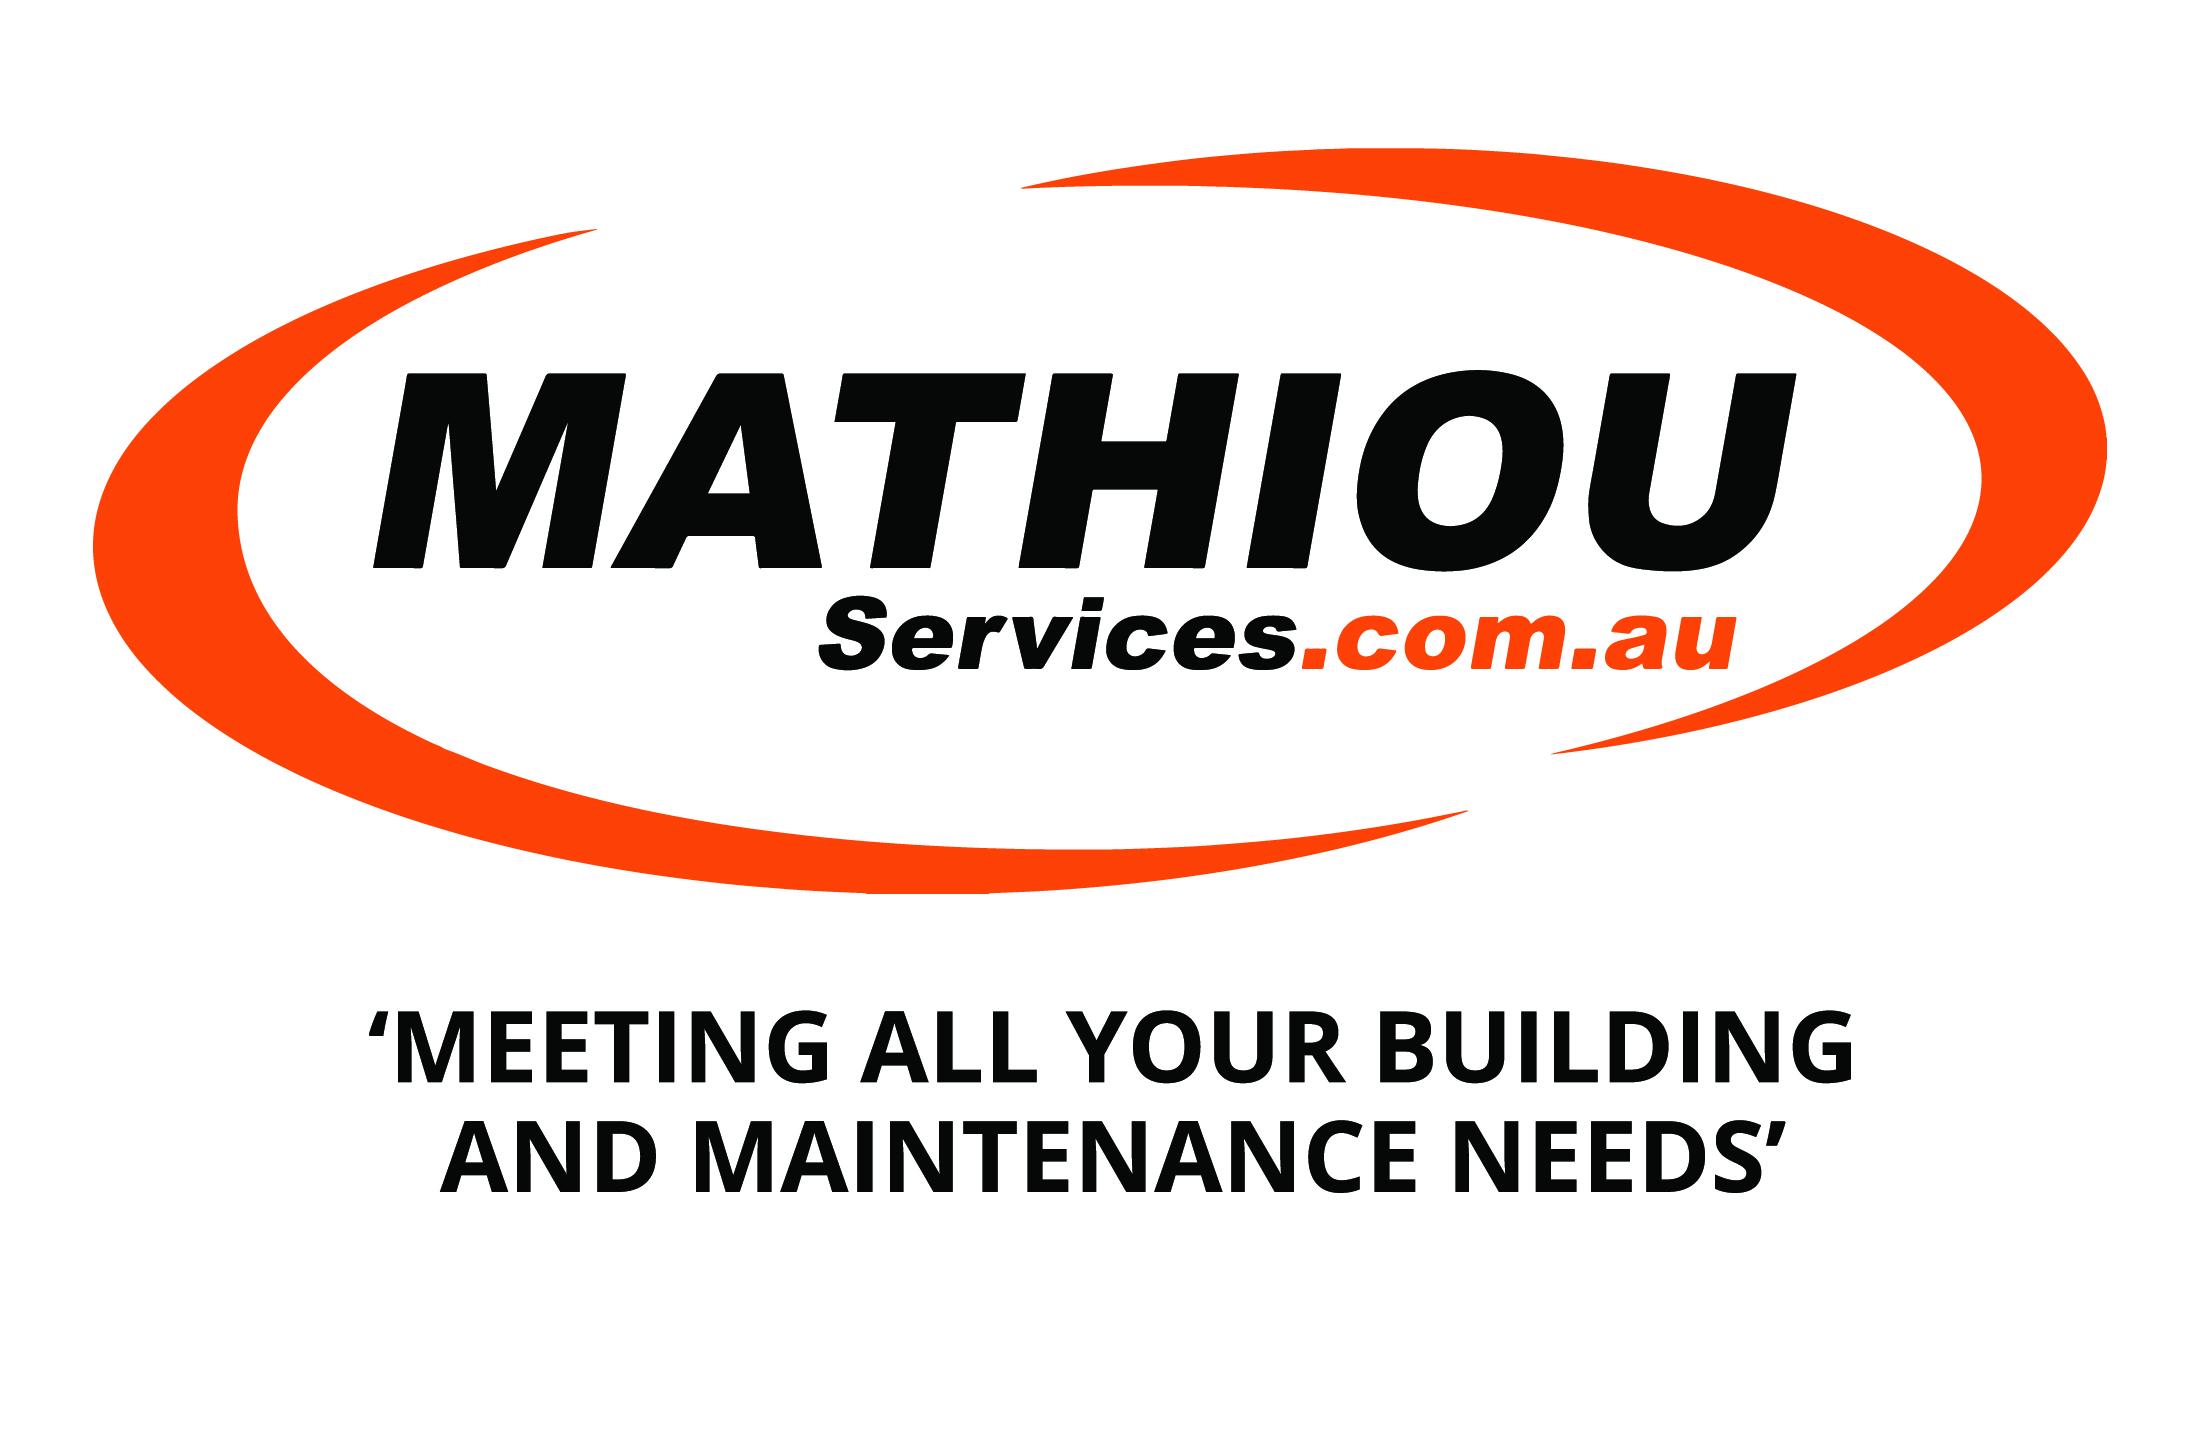 Mathiou-Recreated-Logo-2-tone-logo-wTAG-CMYK-HR-01.jpg?mtime=20191107145901#asset:2649